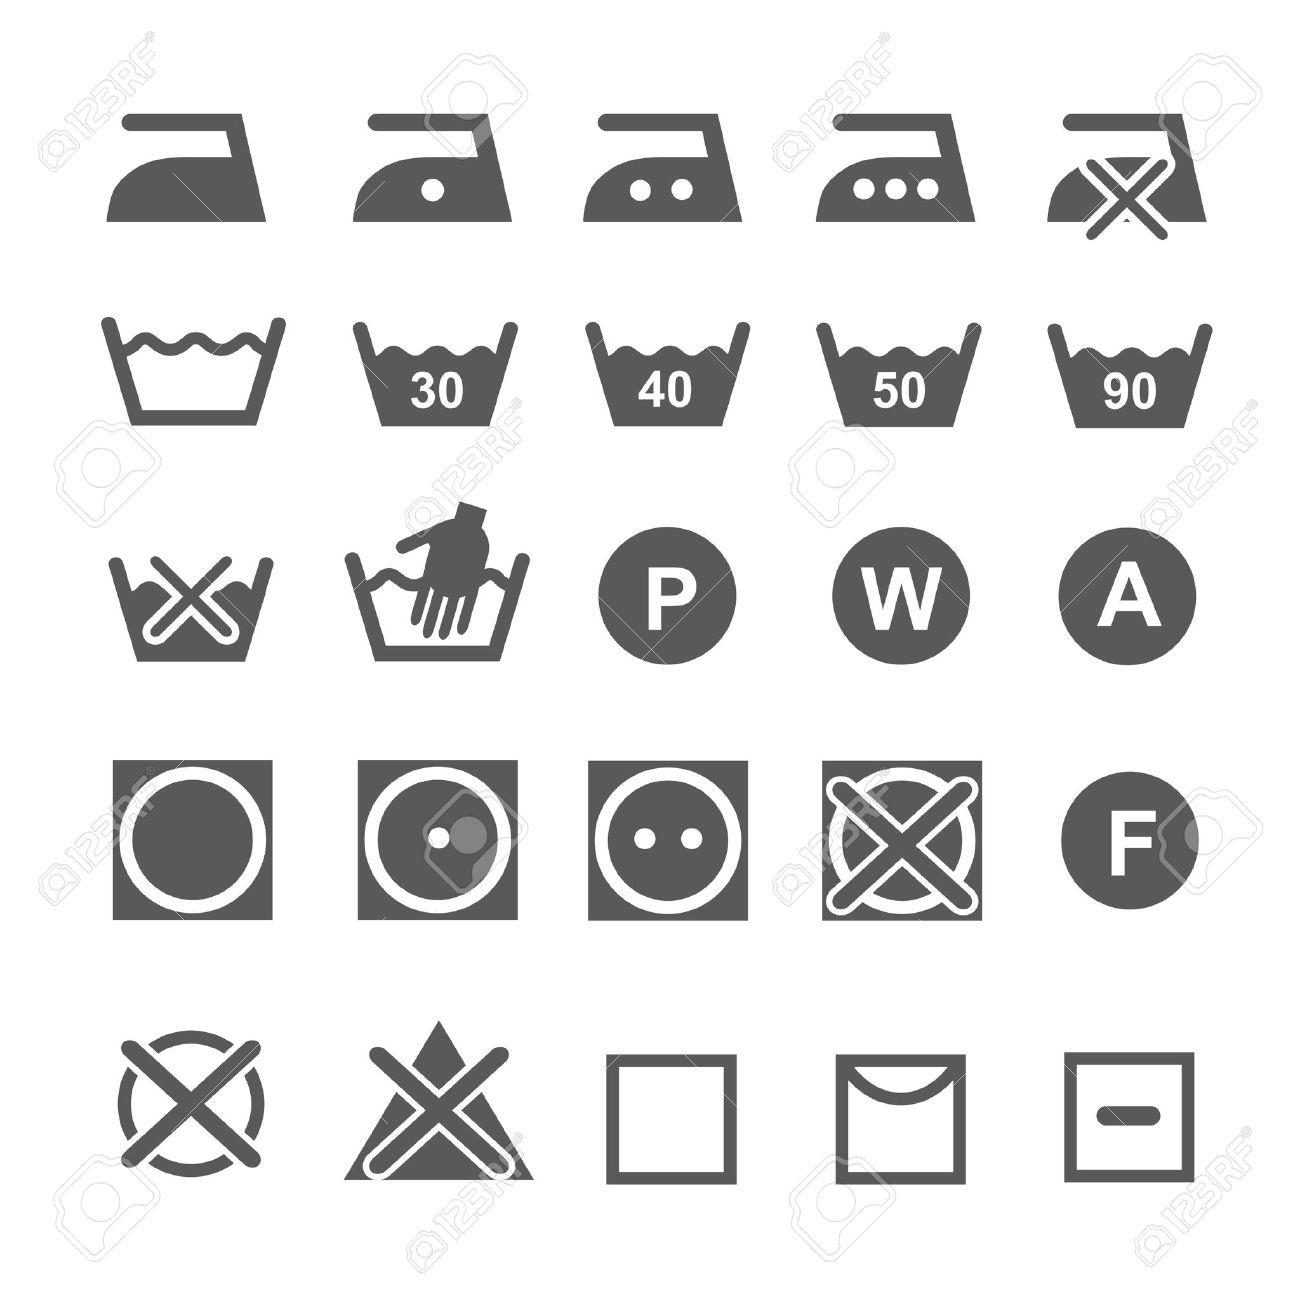 Set of washing symbols laundry icons isolated on white background set of washing symbols laundry icons isolated on white background stock vector 35333484 biocorpaavc Image collections